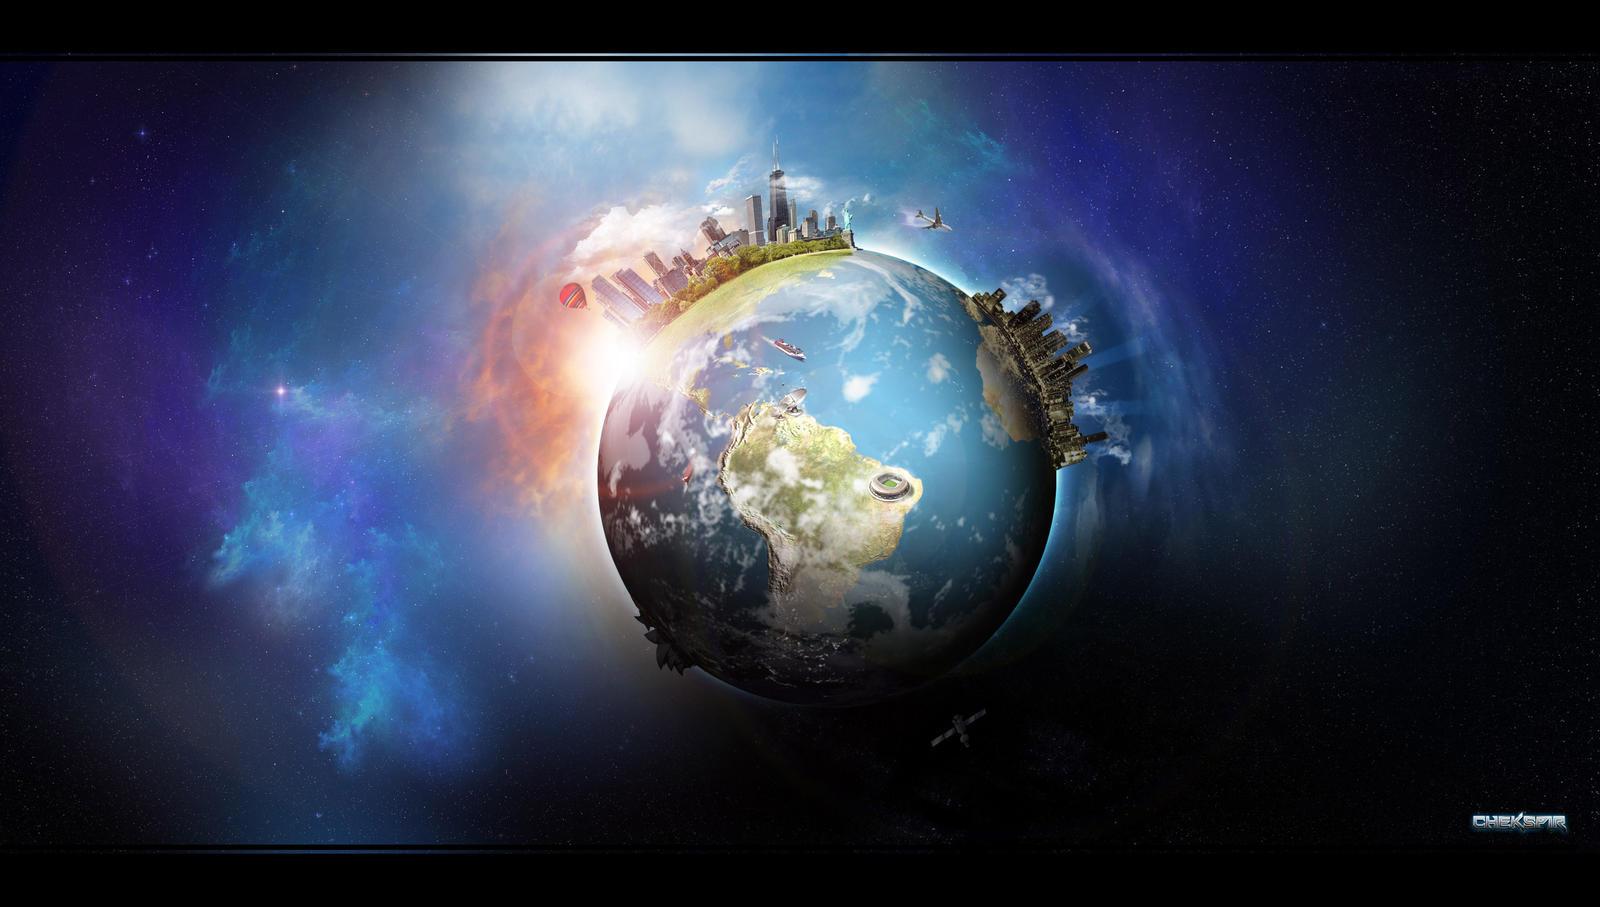 Earth Digital Art Hd Wallpaper: Planet Earth By Chekspir On DeviantArt